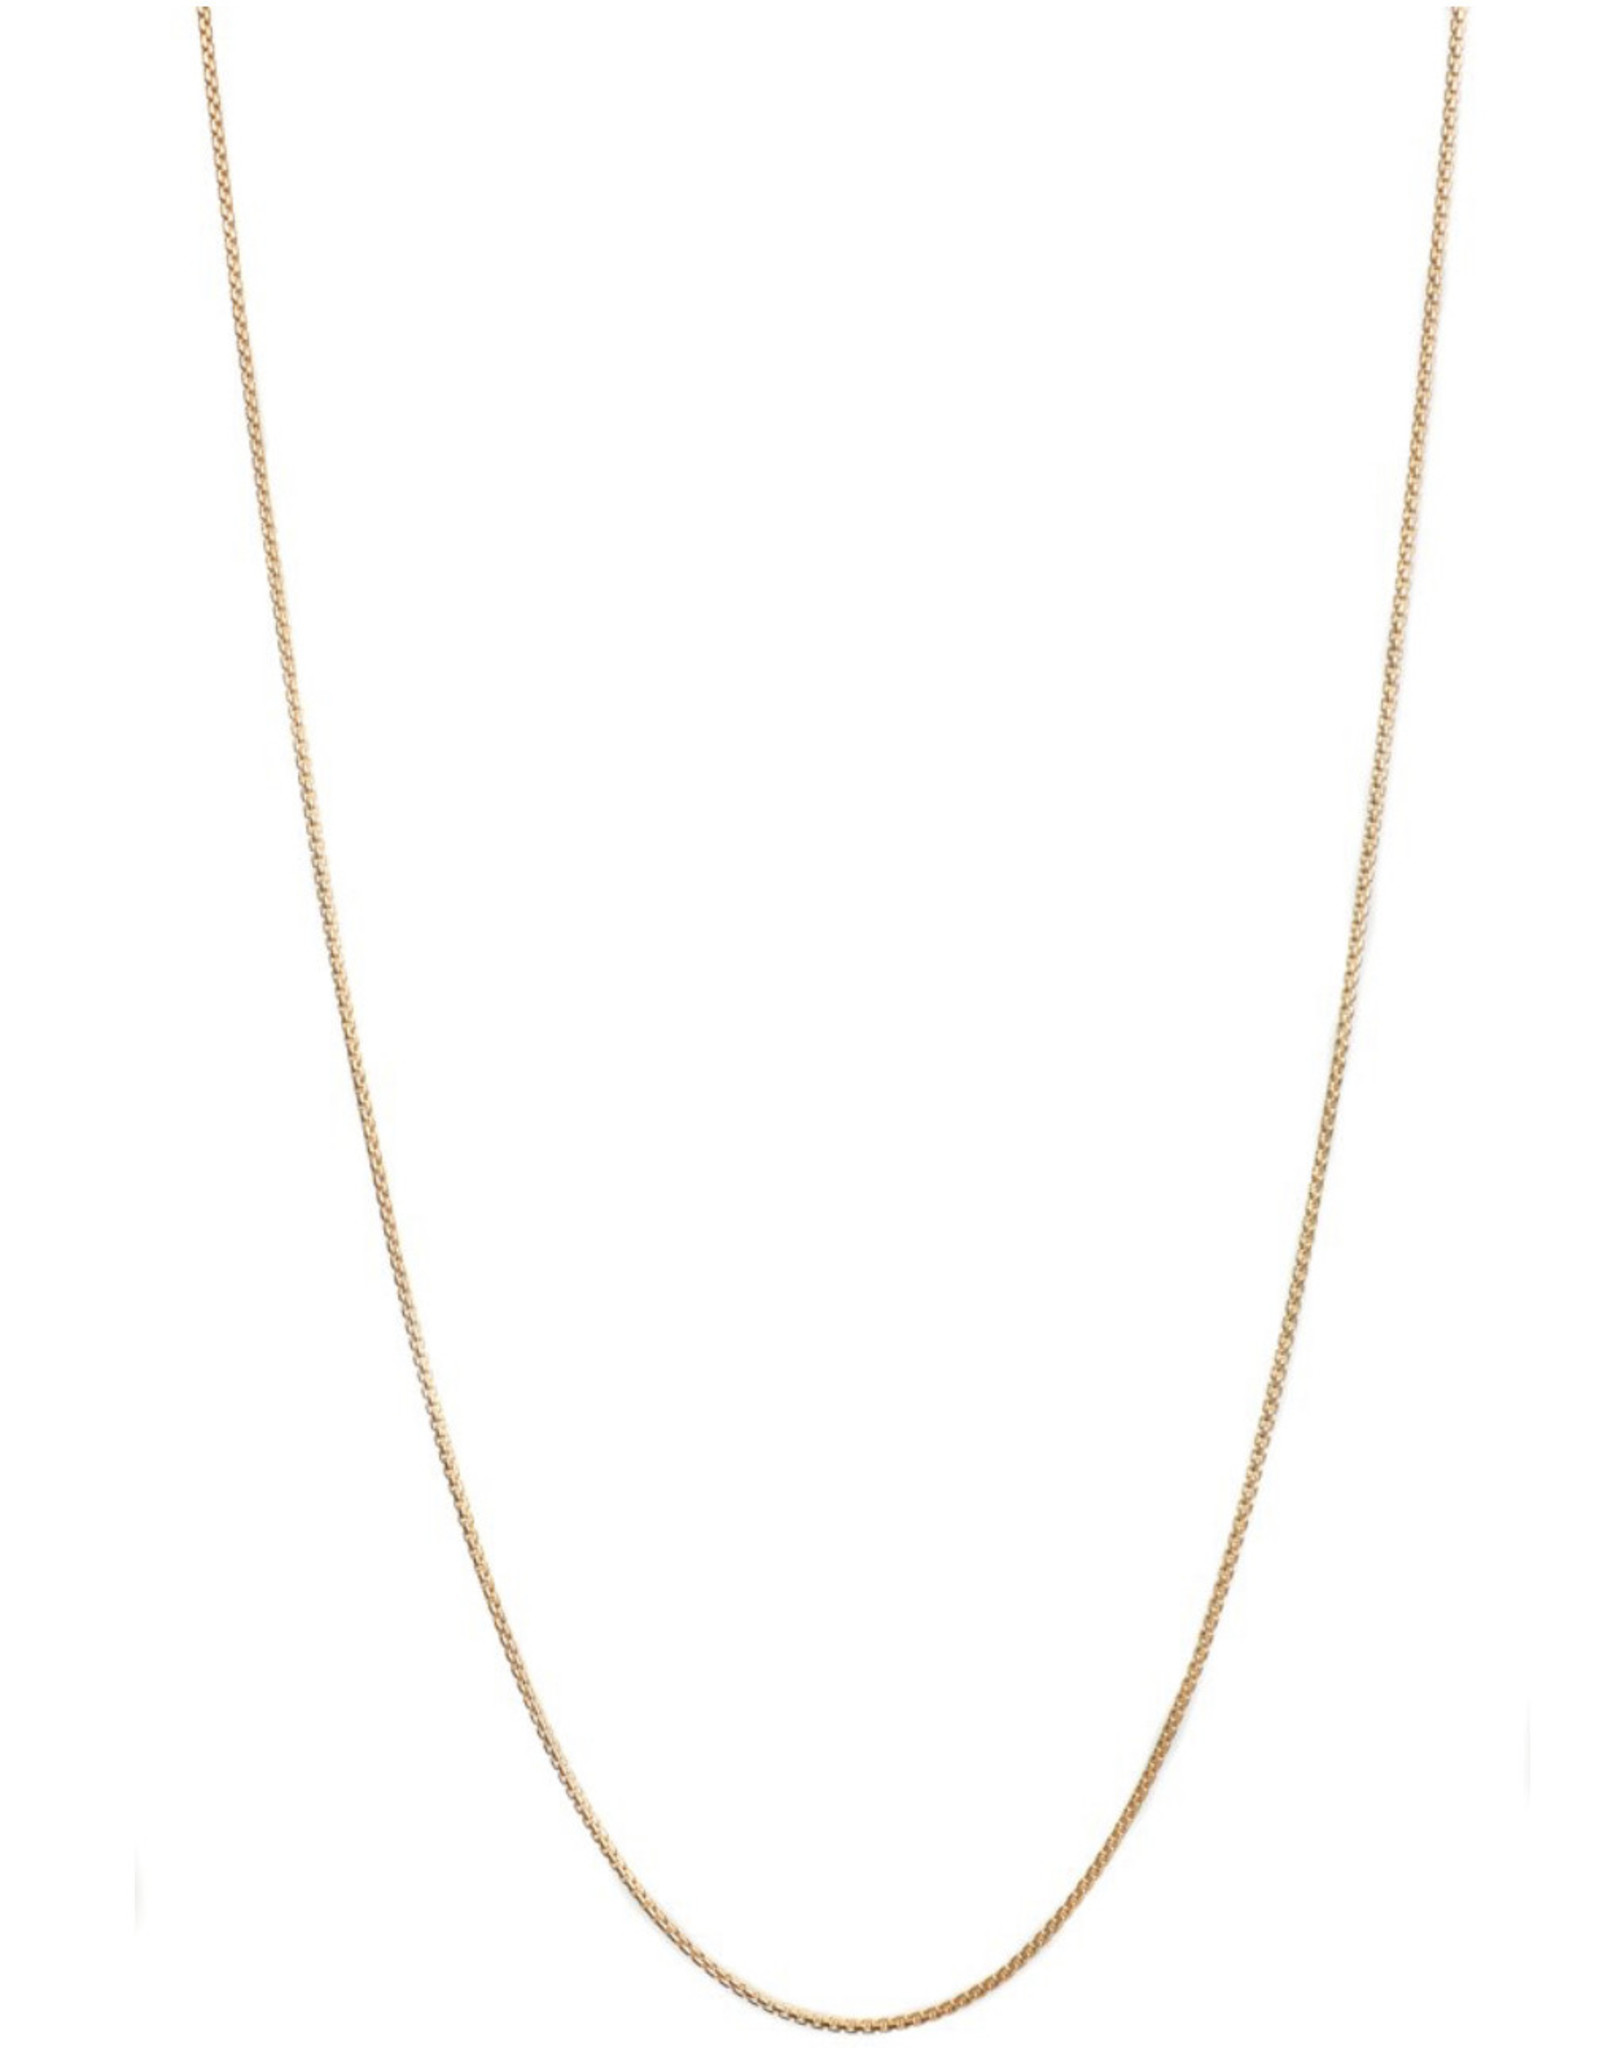 Lisbeth TANTOT Necklace